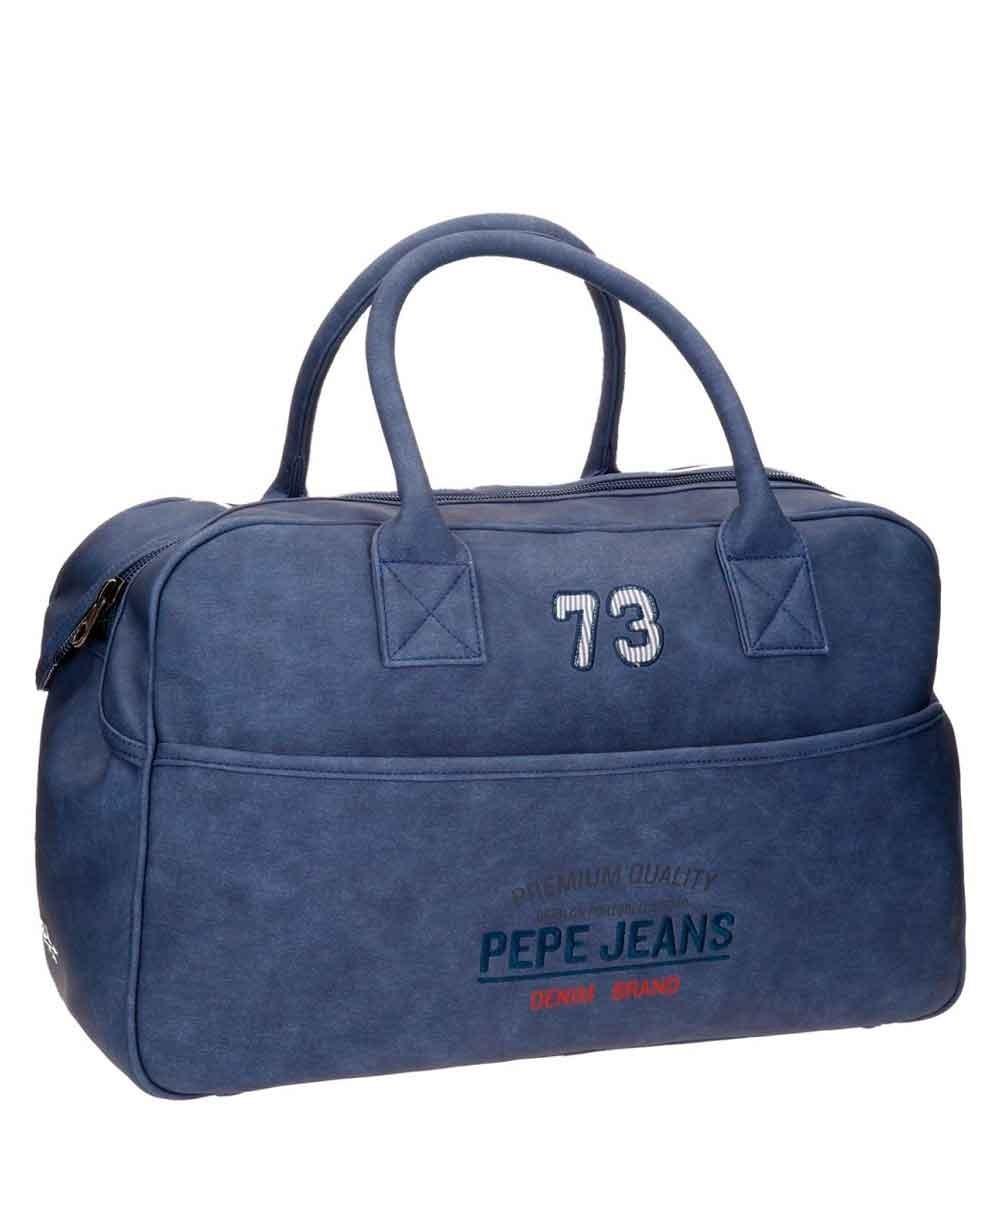 Pepe Jeans Jack Bolsa de Viaje Azul (Foto )